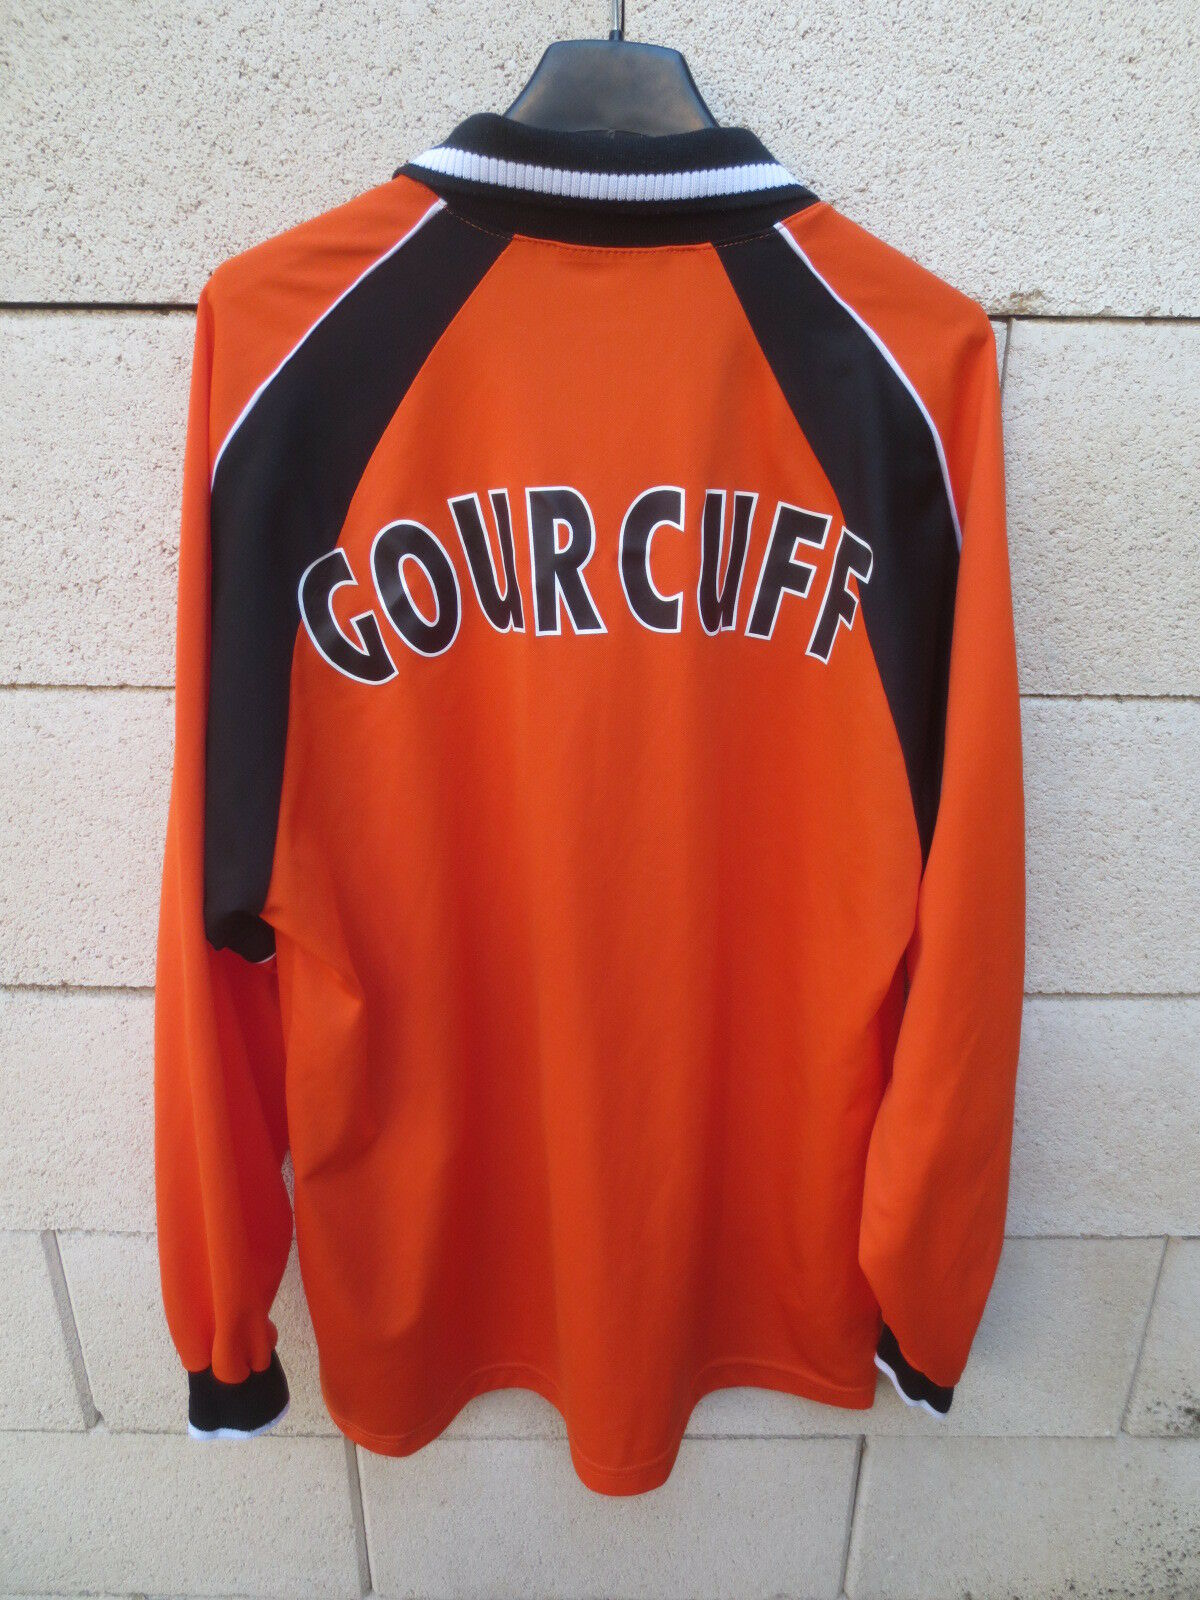 Maillot F.C LORIENT vintage ERREA shirt shirt shirt no sponsor GOURCUFF manches longues XXL   Materiali Di Alta Qualità    Di Alta Qualità    Numerosi In Varietà  989de4